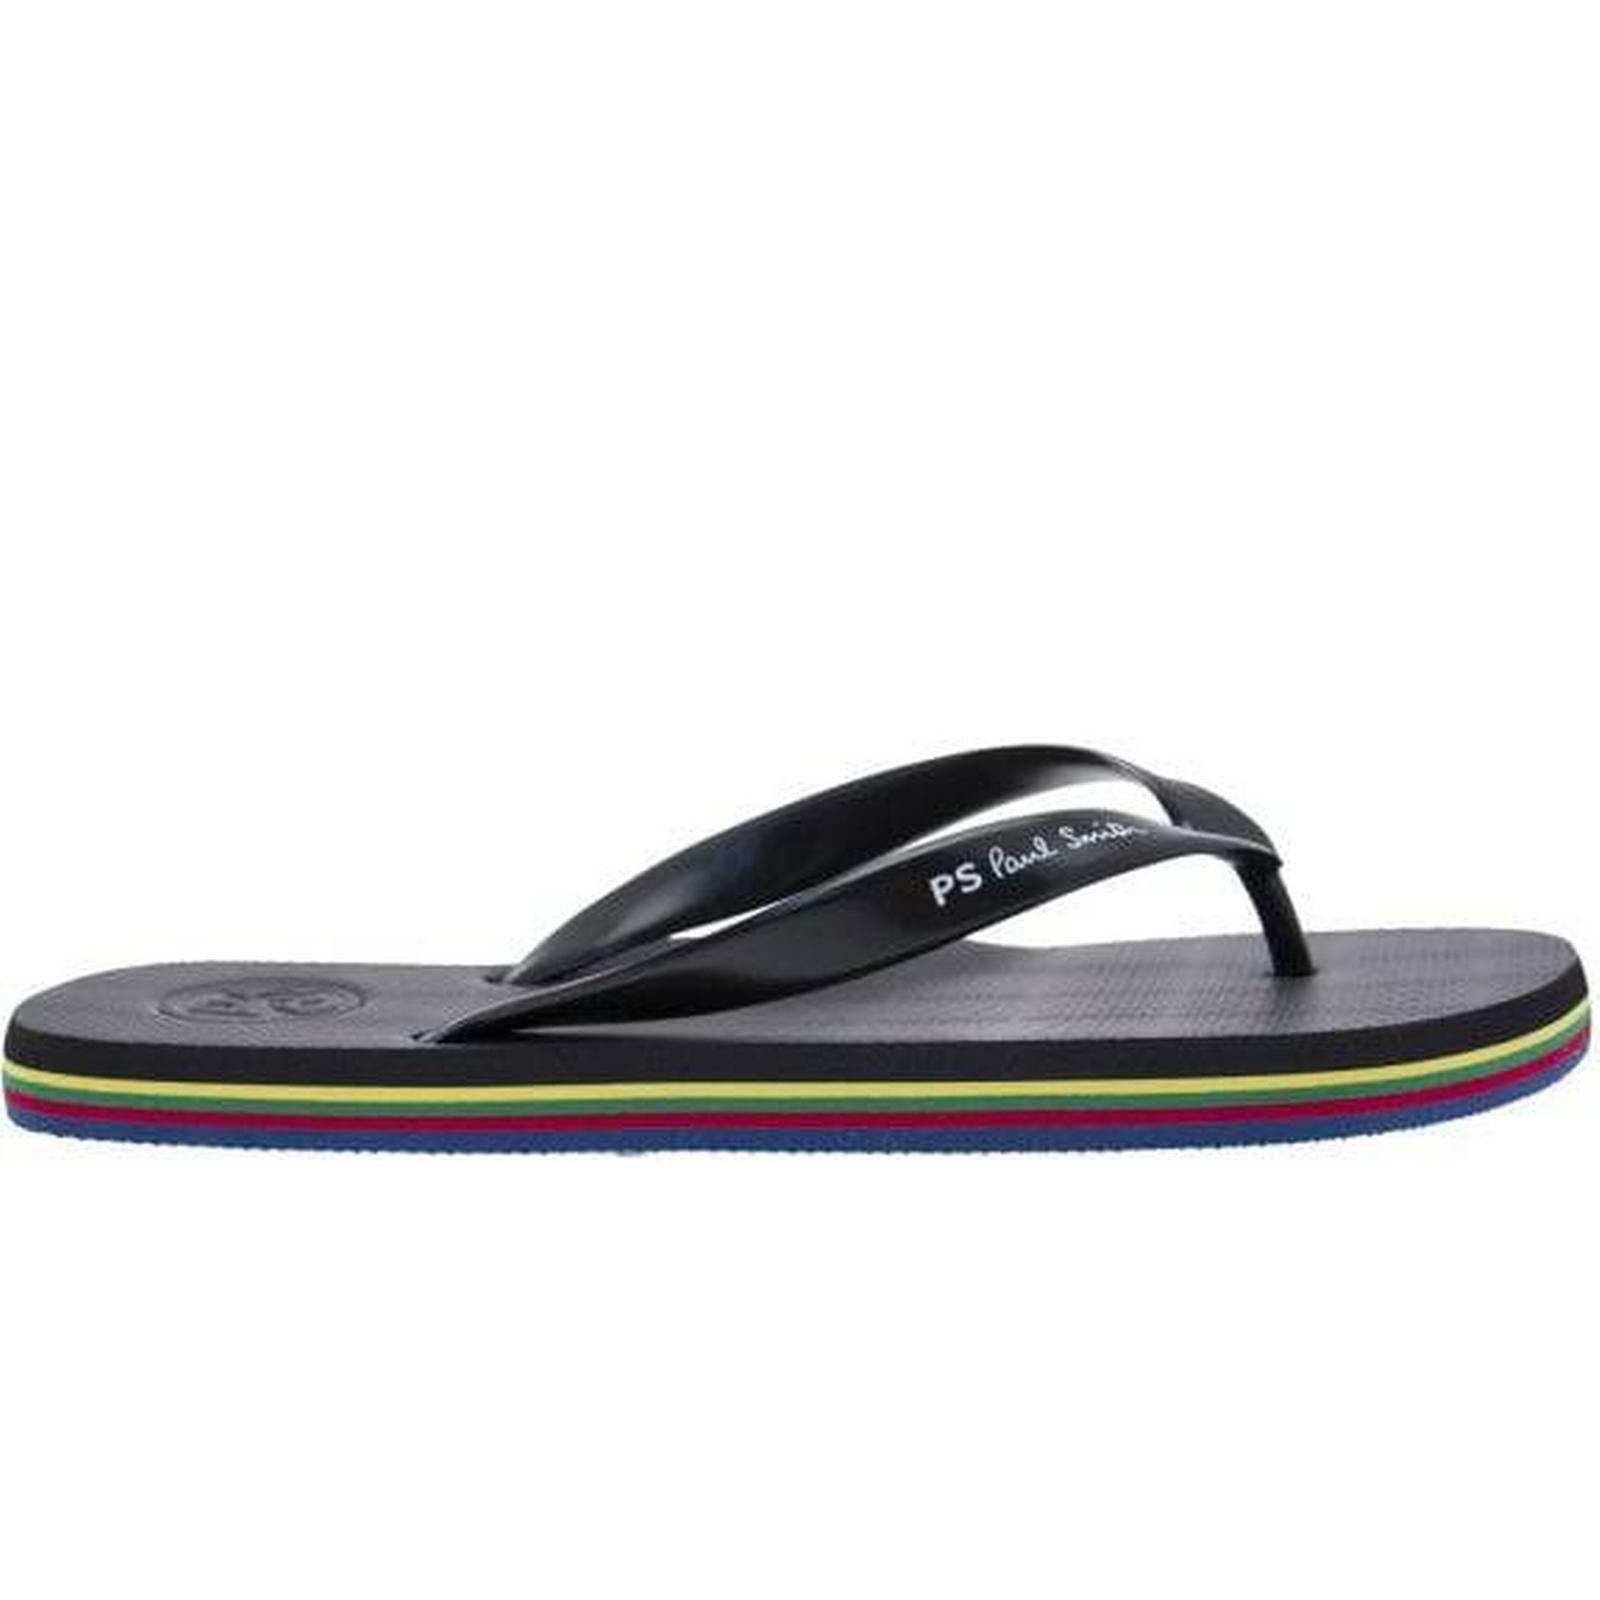 PS Paul Smith Mens Black Logo Flip Flops Size: S S Size: c8fabd